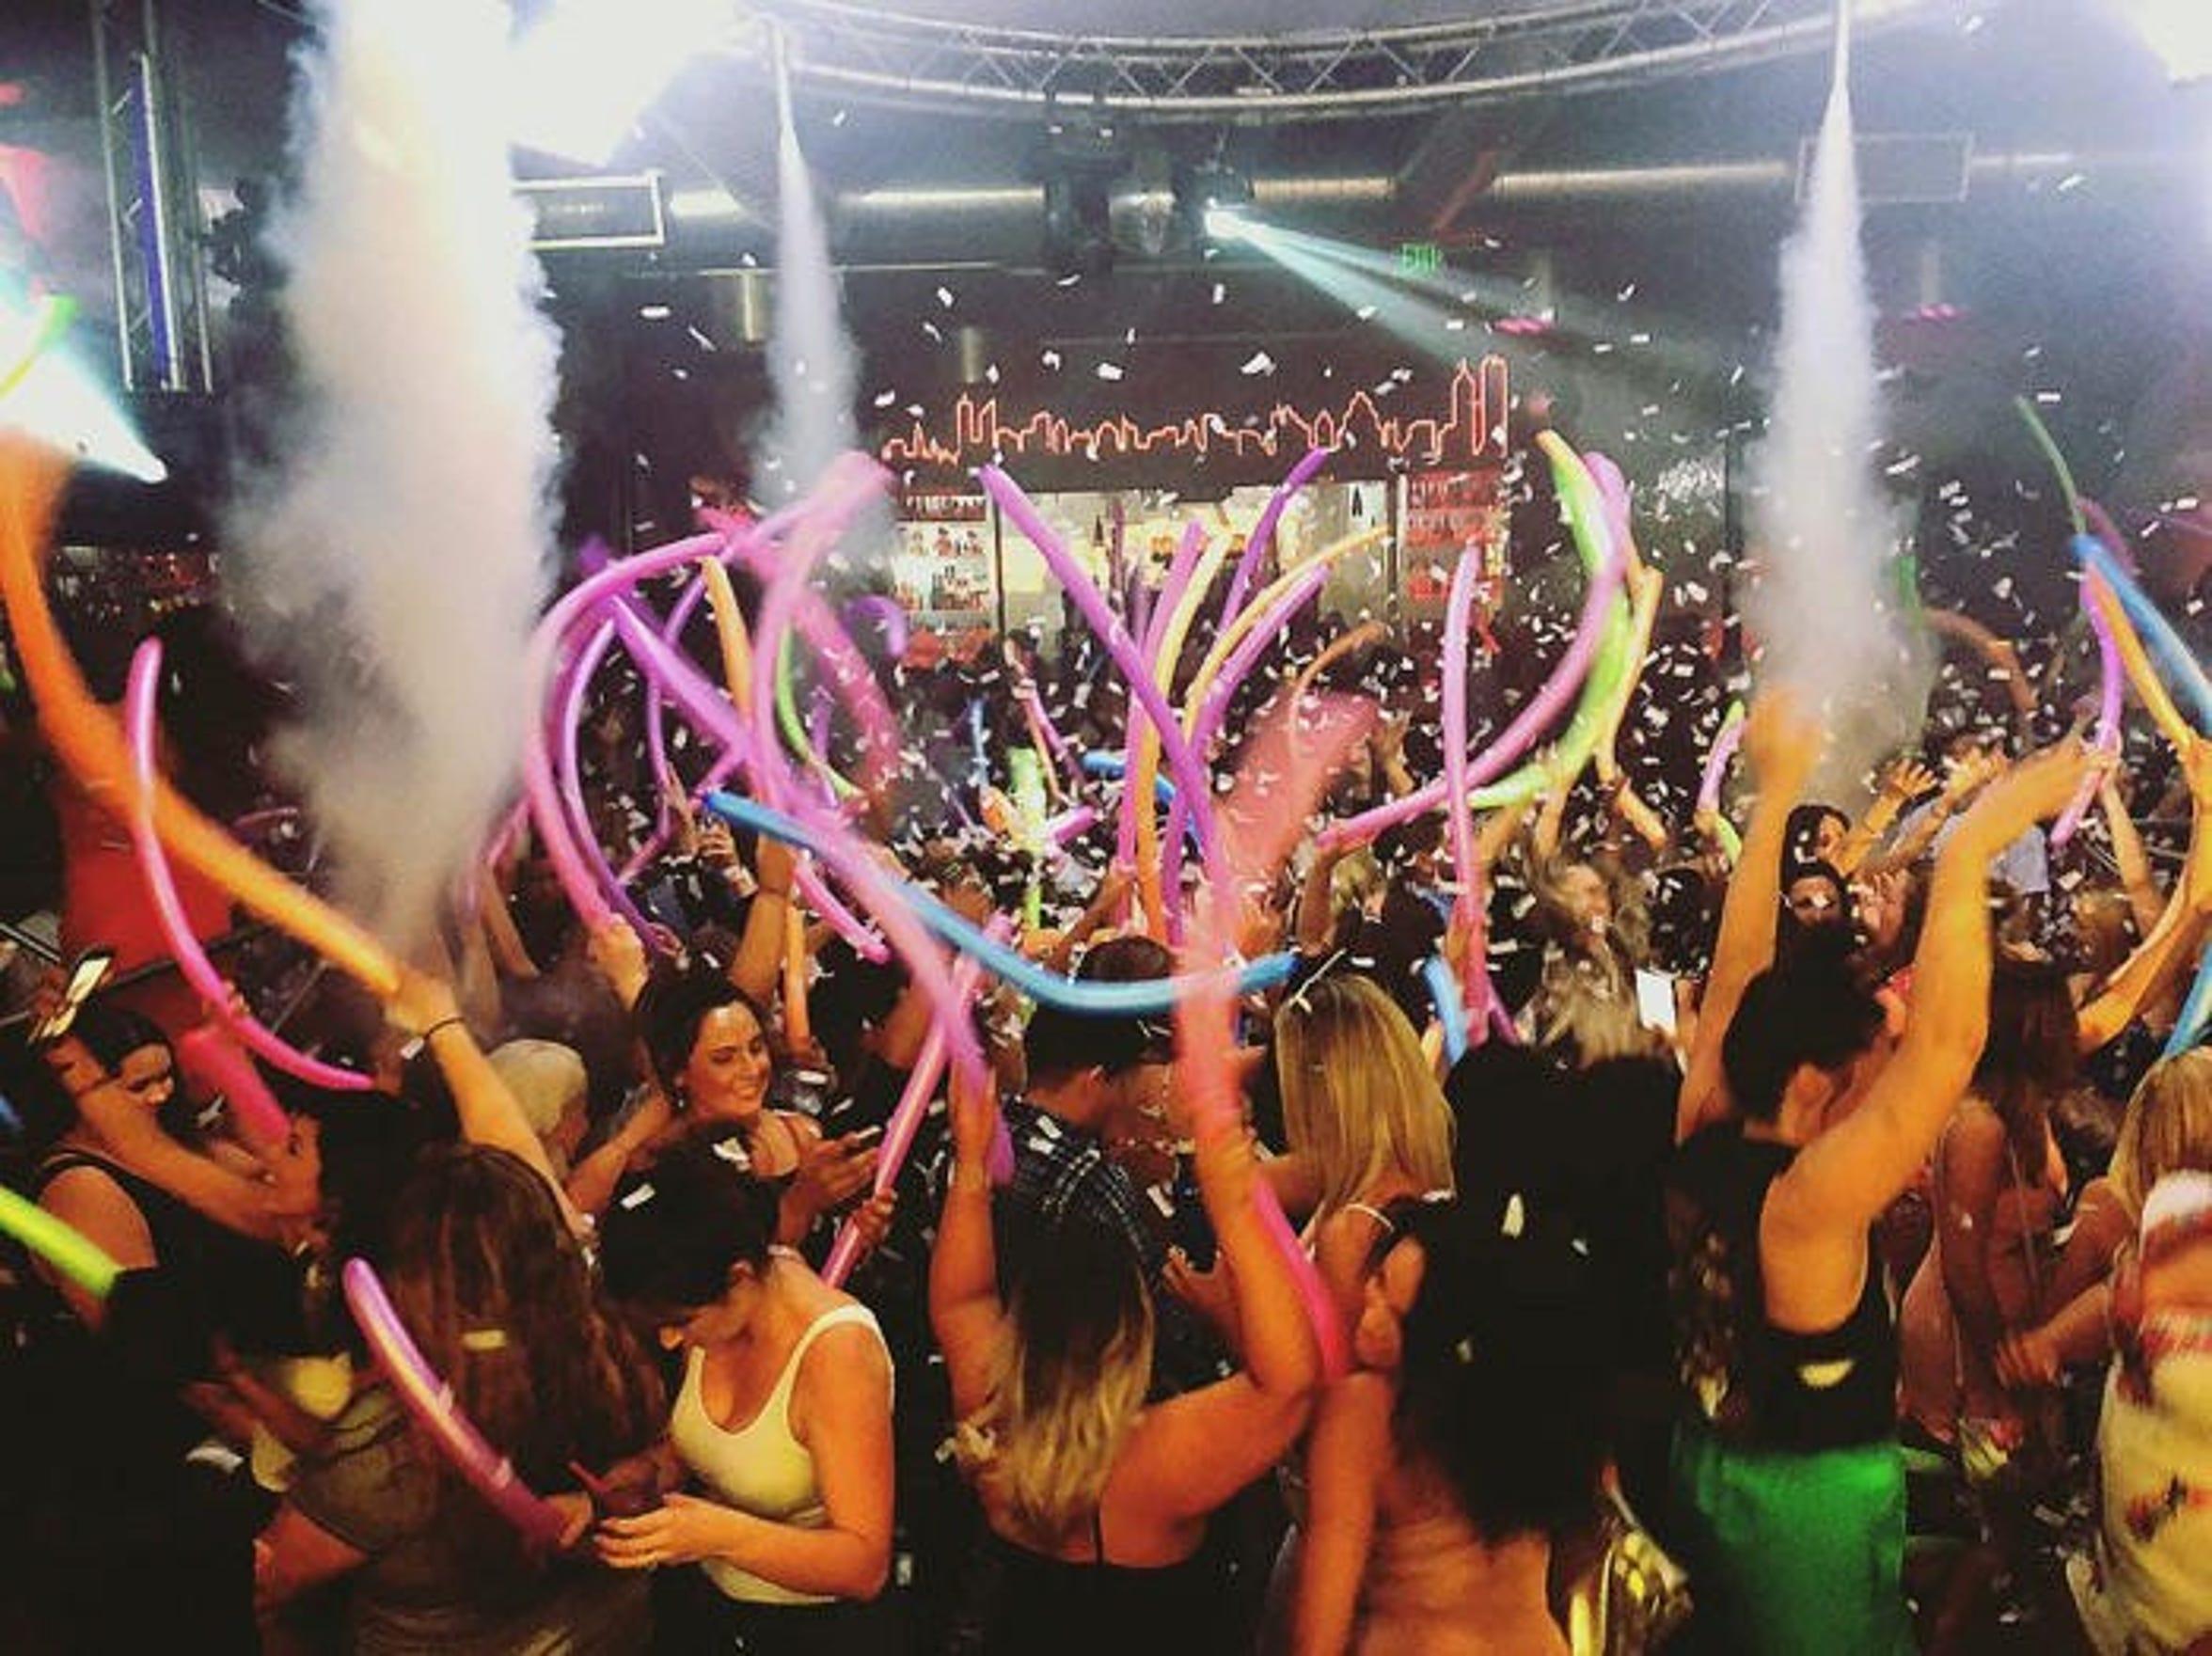 Zeldas Nightclub.